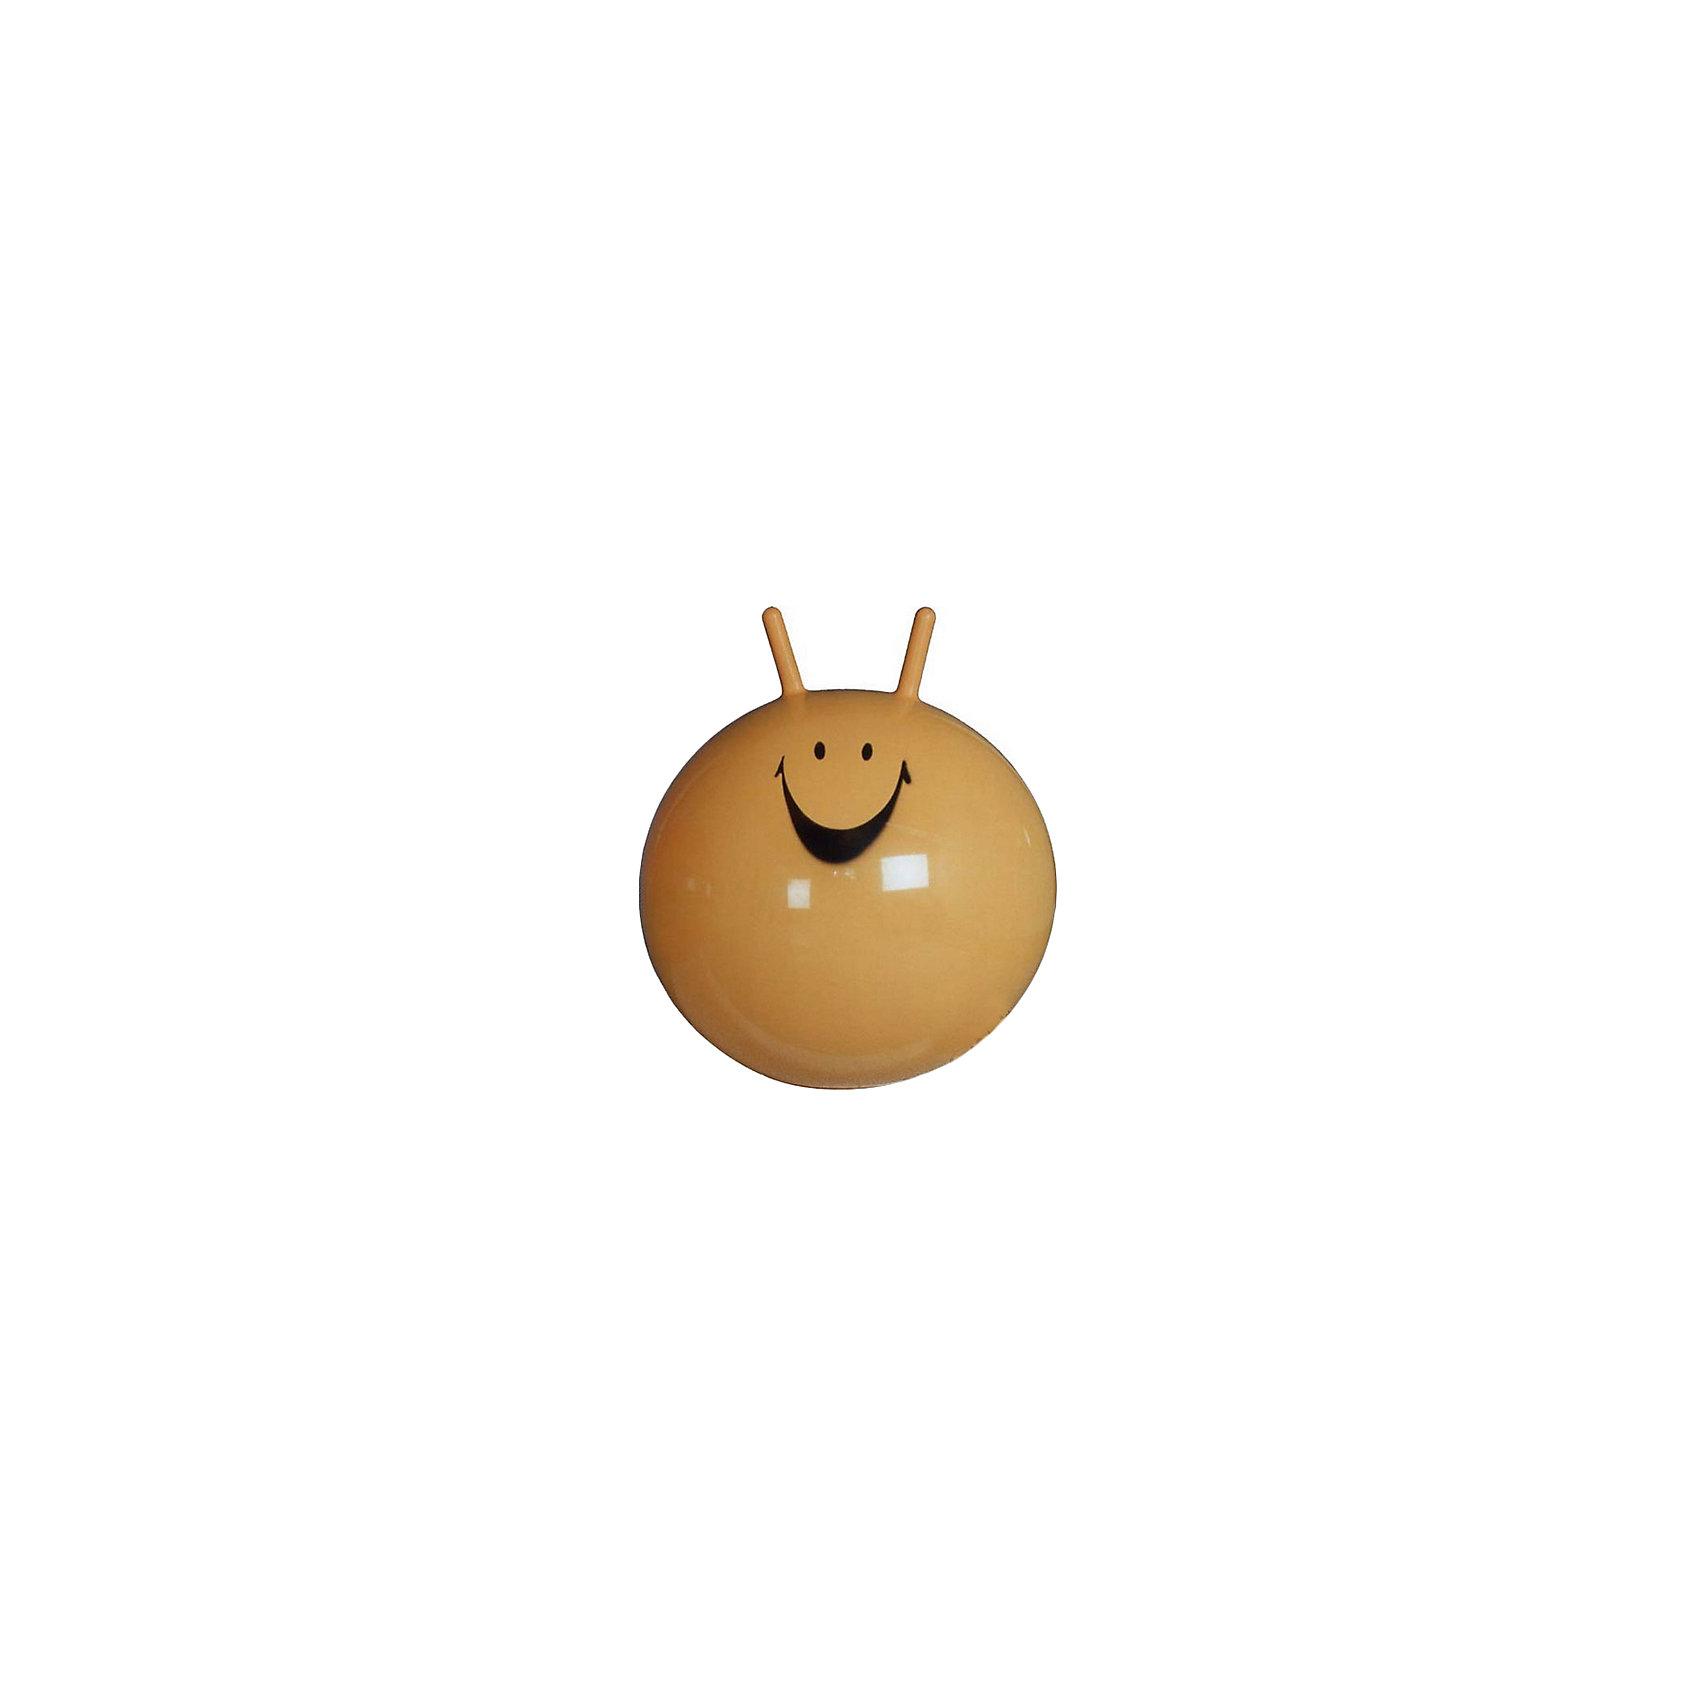 Мяч-прыгун, 55см, желтый, ARPAXМячи детские<br><br><br>Ширина мм: 550<br>Глубина мм: 550<br>Высота мм: 550<br>Вес г: 750<br>Возраст от месяцев: 36<br>Возраст до месяцев: 120<br>Пол: Унисекс<br>Возраст: Детский<br>SKU: 4785521